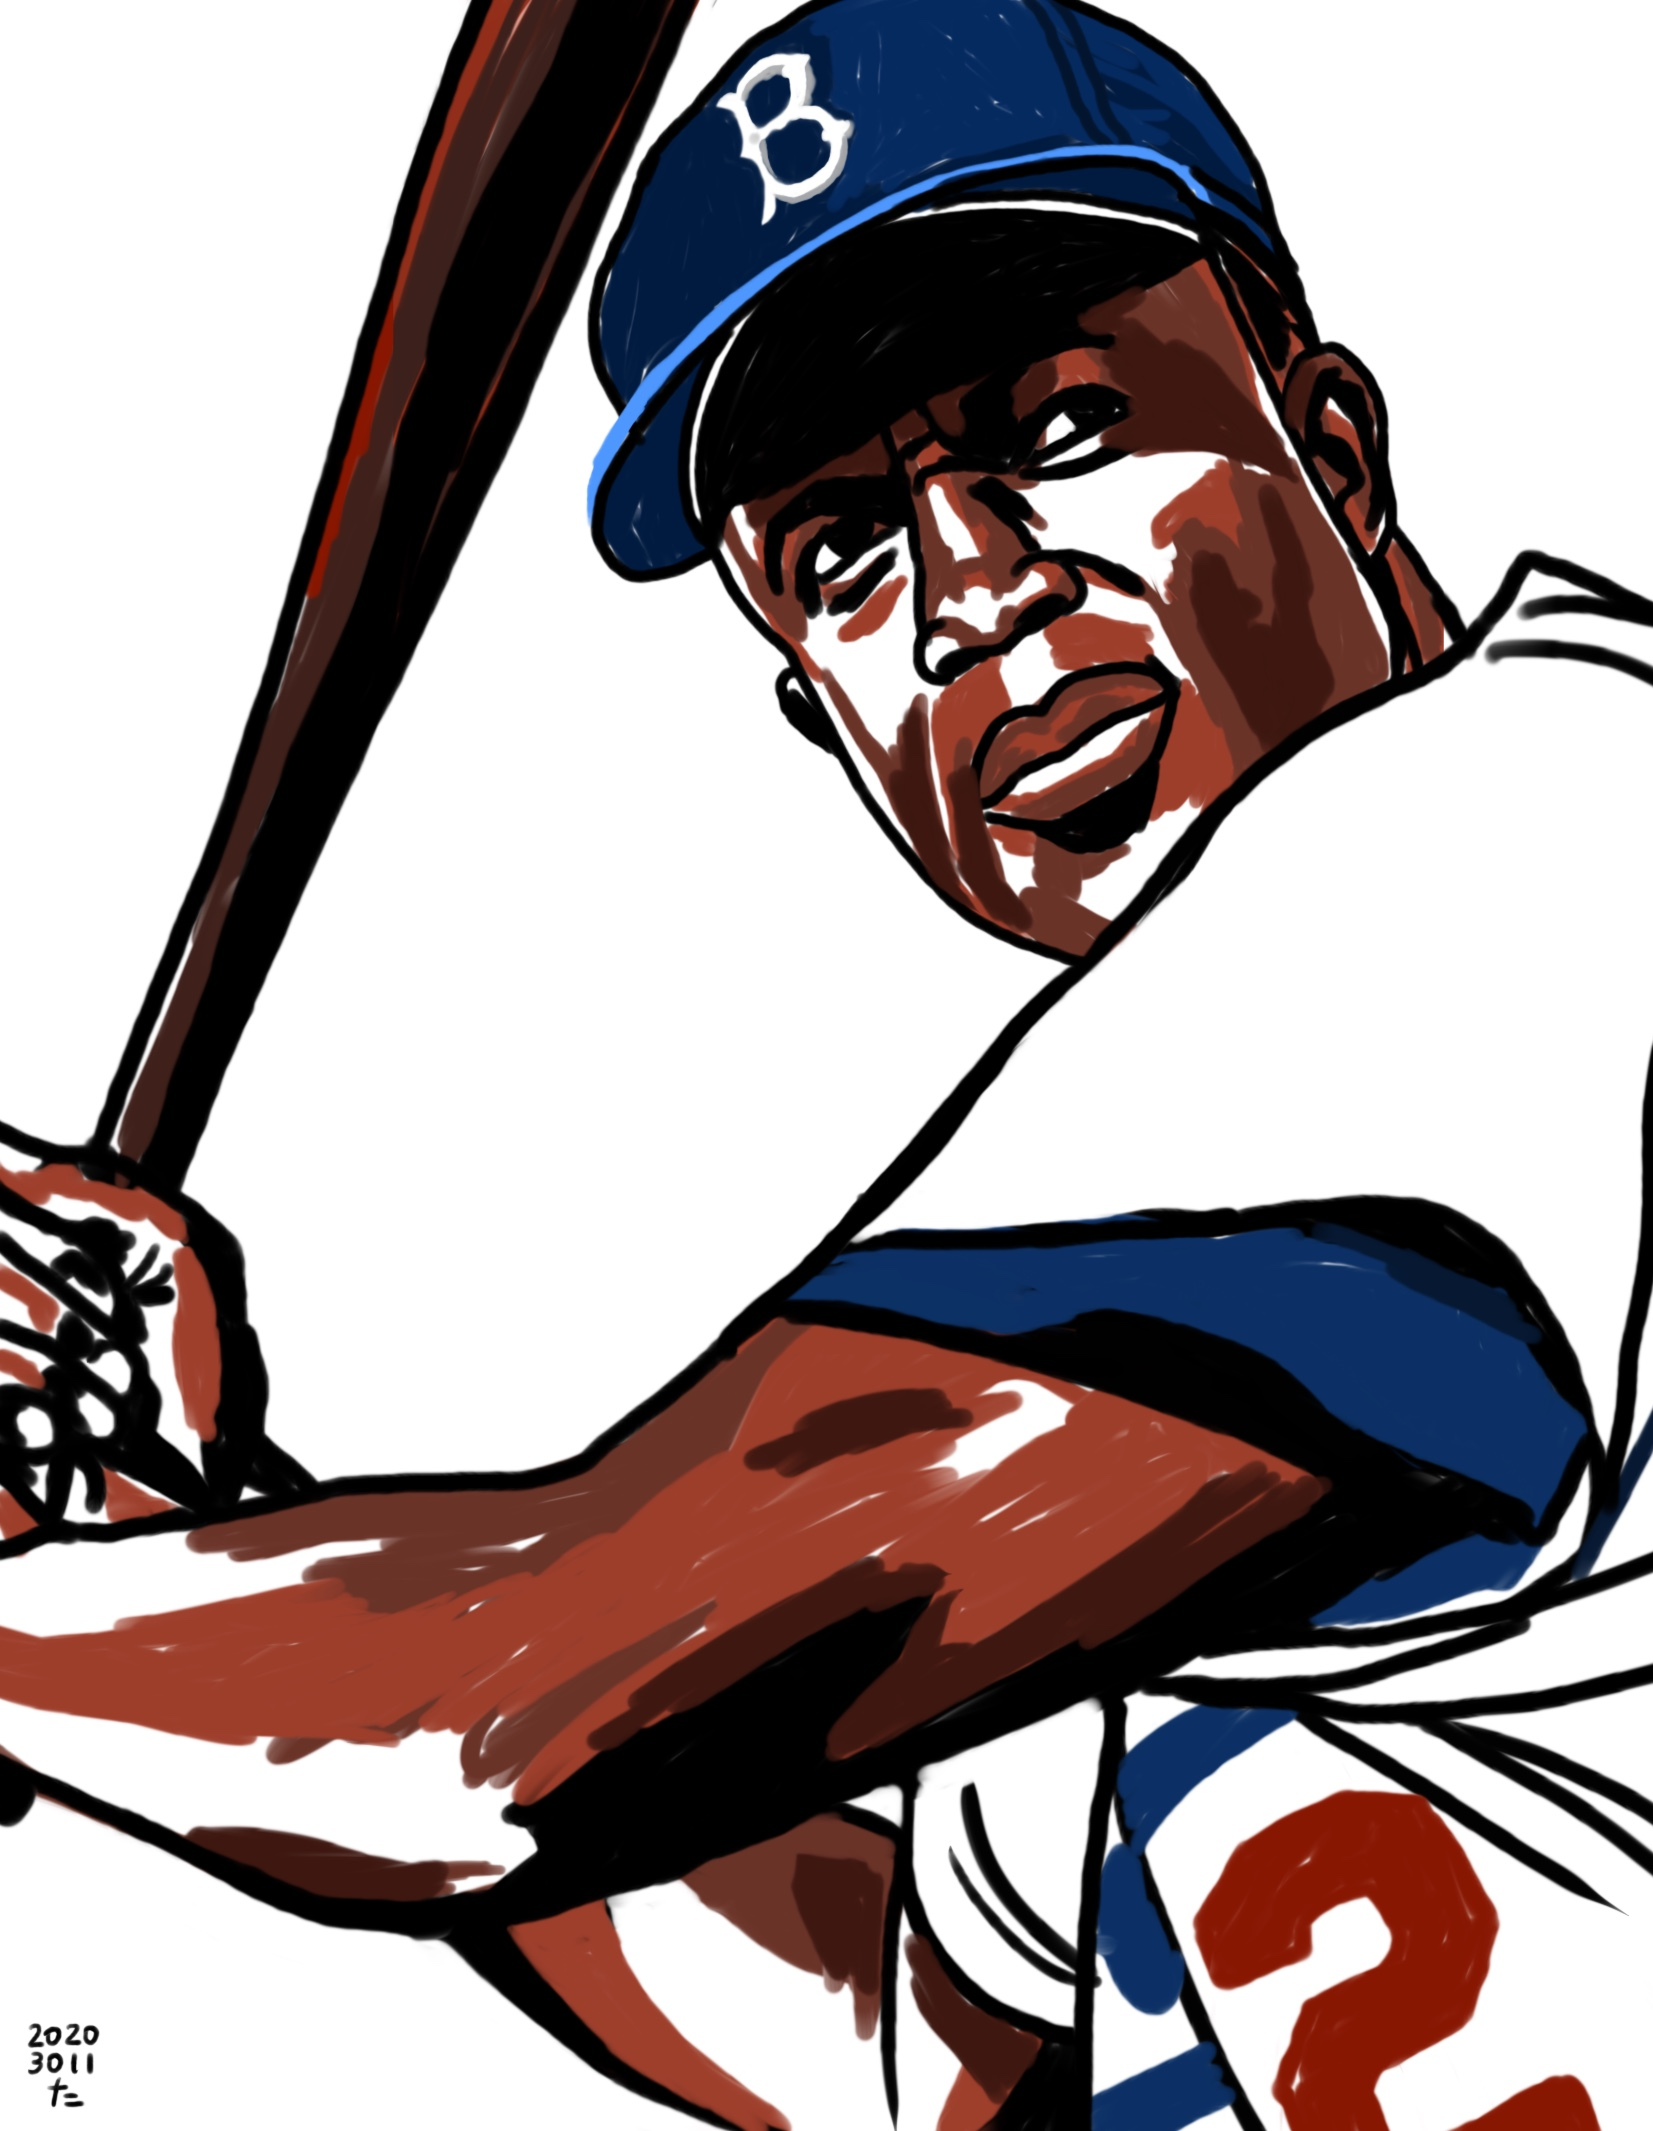 illustration of Brooklyn Dodgers Jackie Robinson's swing